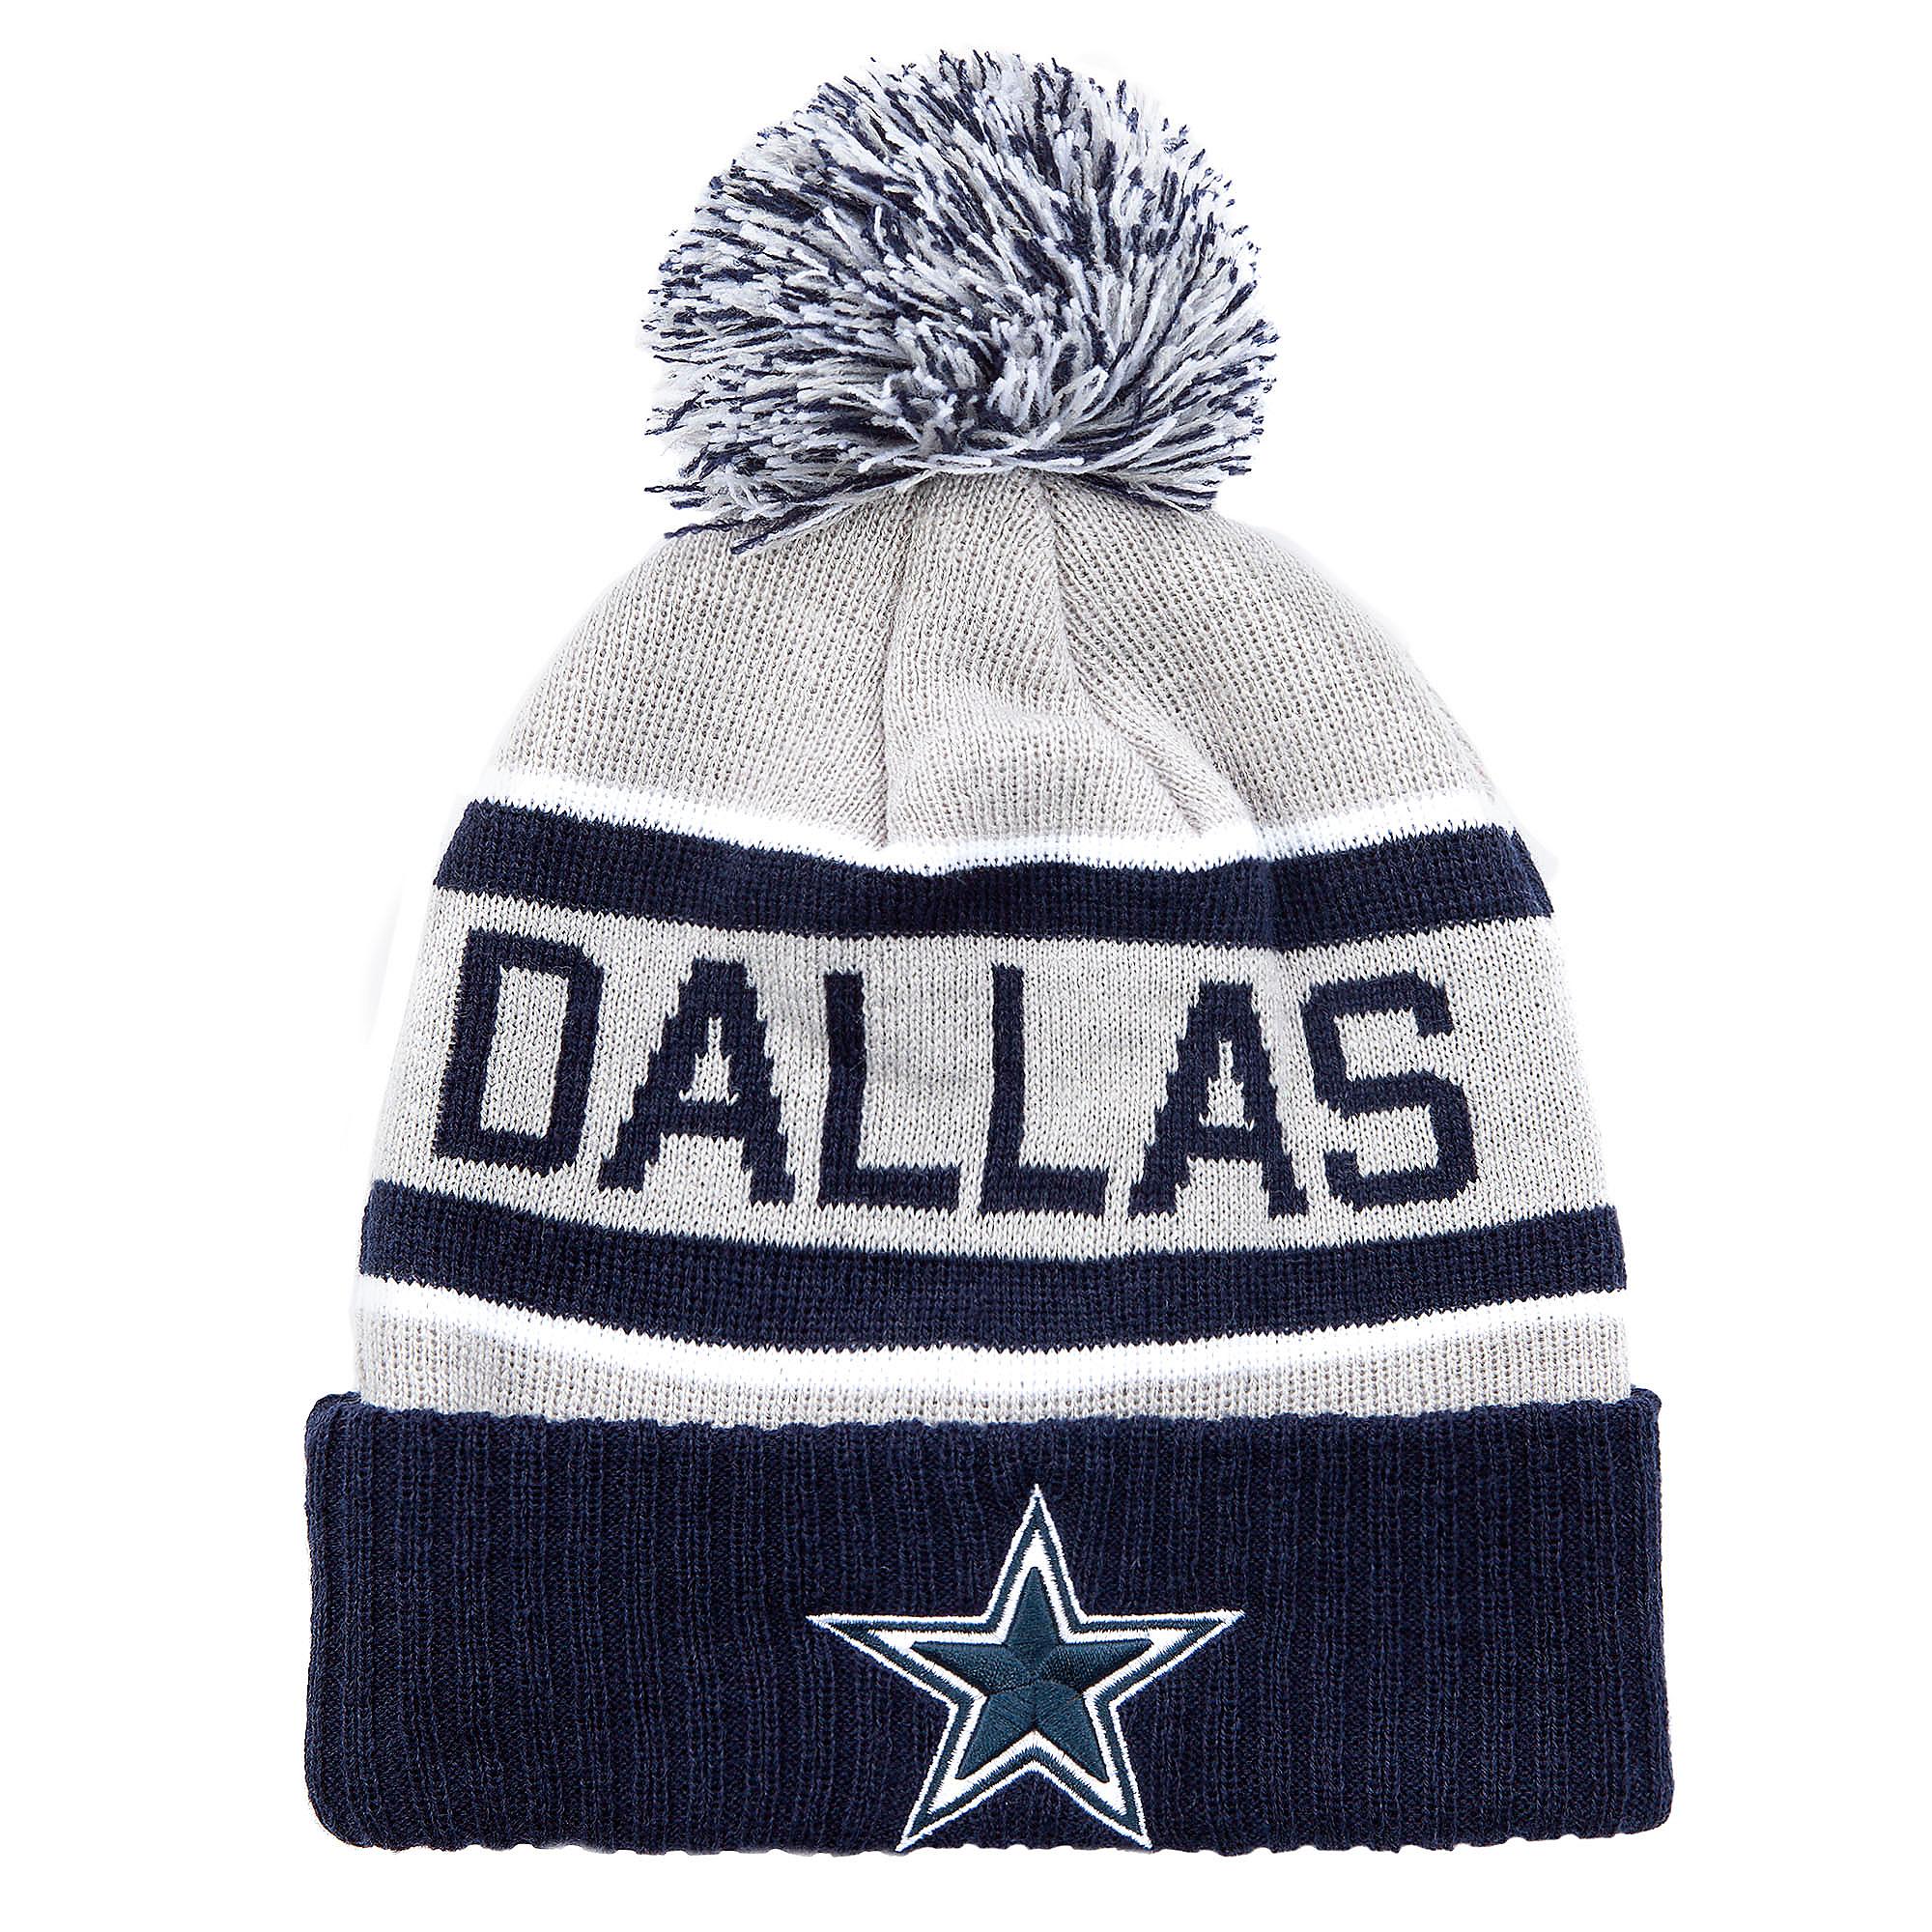 856128ddbac528 Dallas Cowboys Dorian Knit Hat | Dallas Cowboys Pro Shop